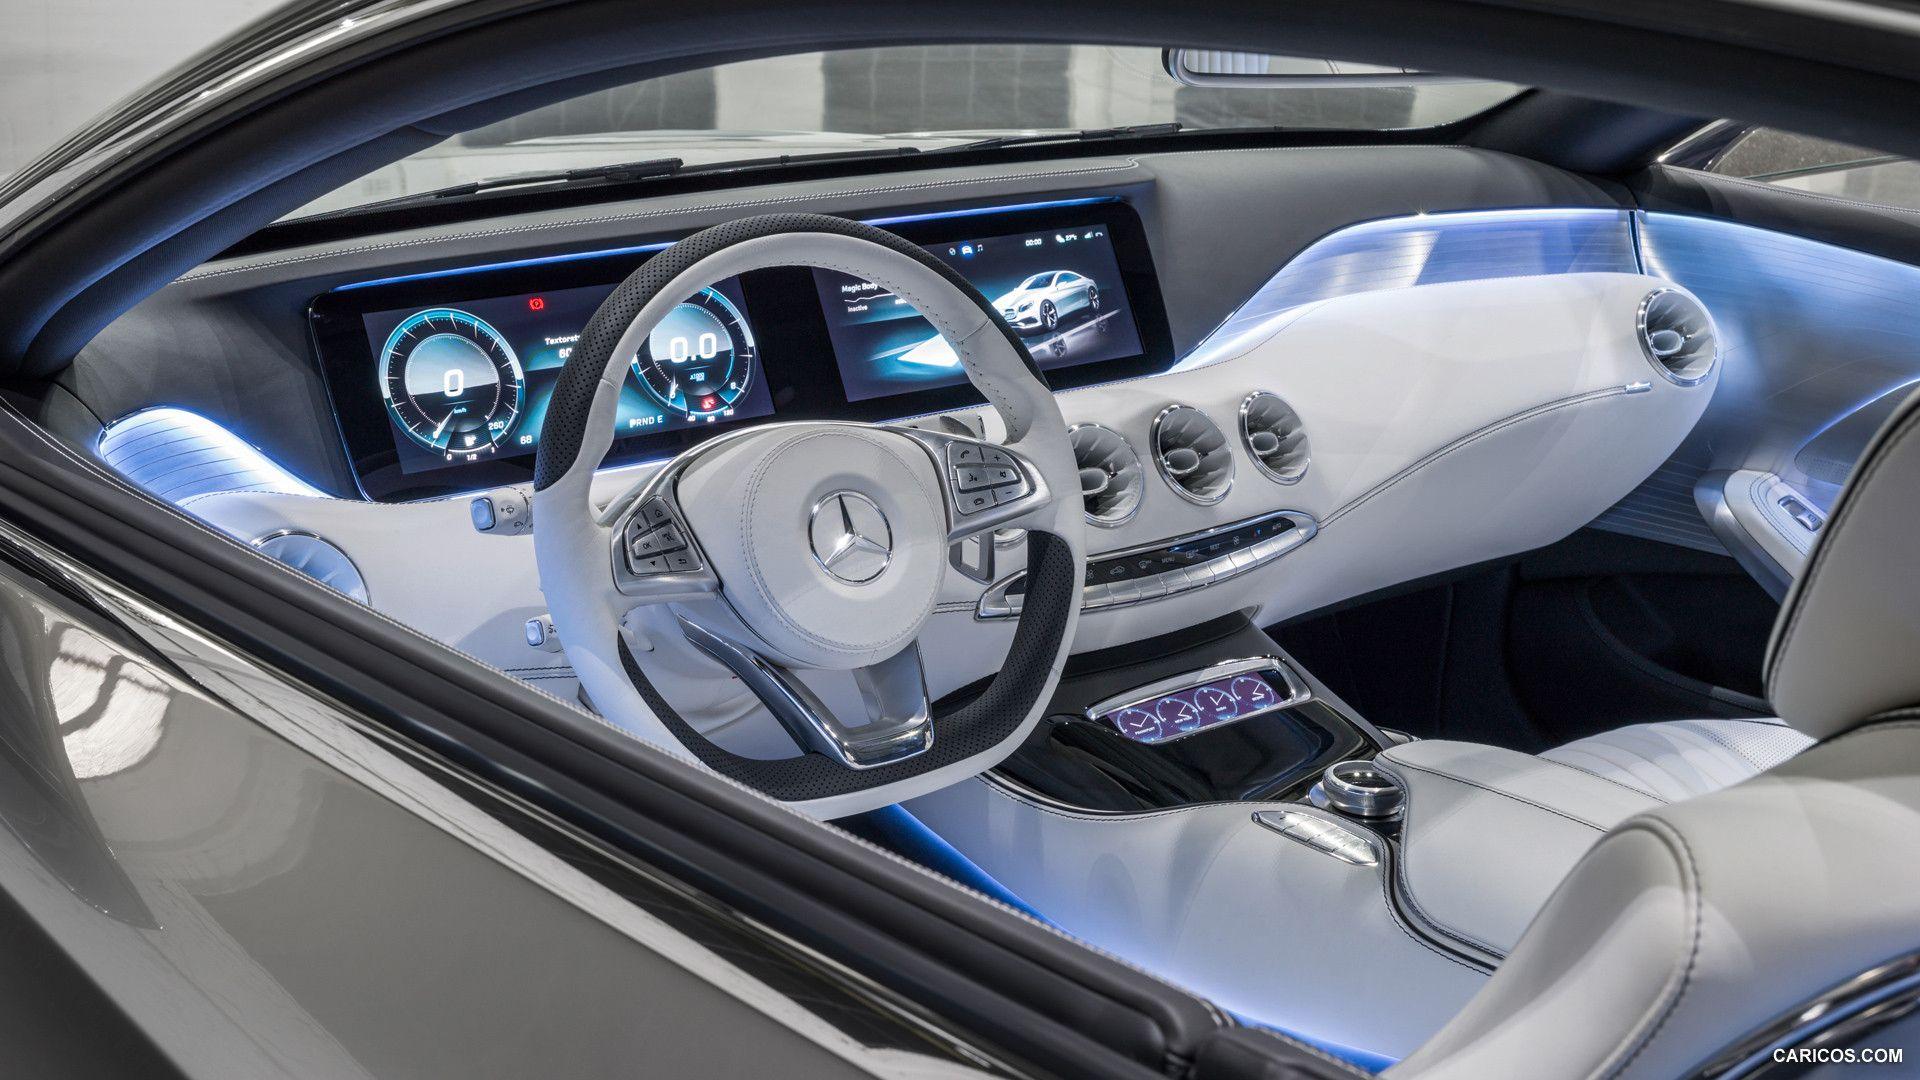 2013 Mercedes Benz S Class Coupe Concept Wallpaper Mersedes Bens